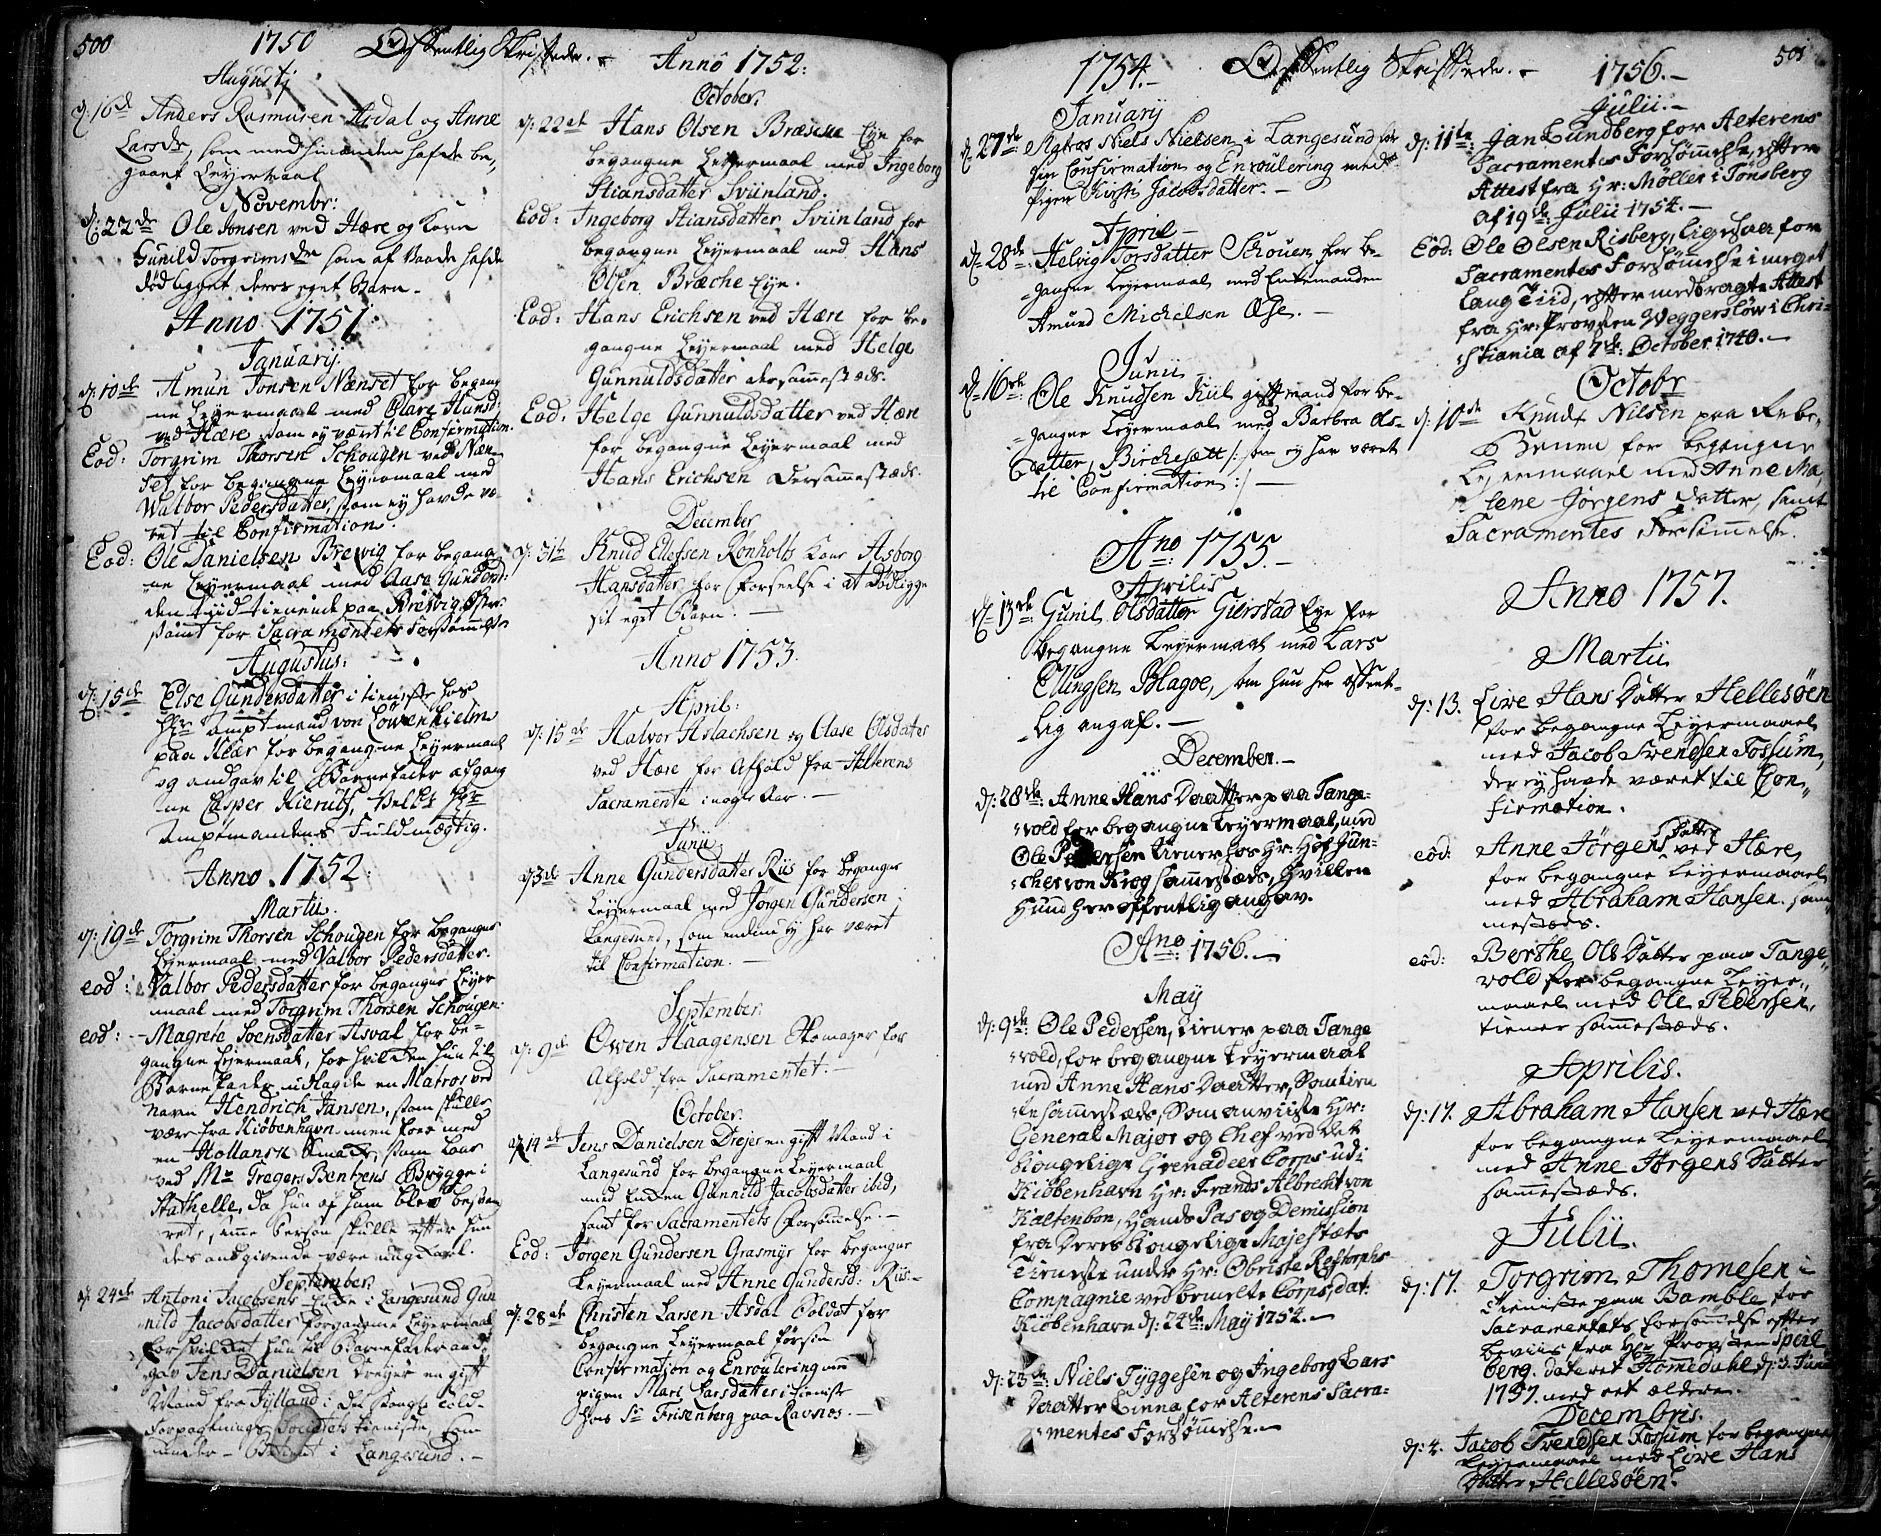 SAKO, Bamble kirkebøker, F/Fa/L0001: Ministerialbok nr. I 1, 1702-1774, s. 500-501